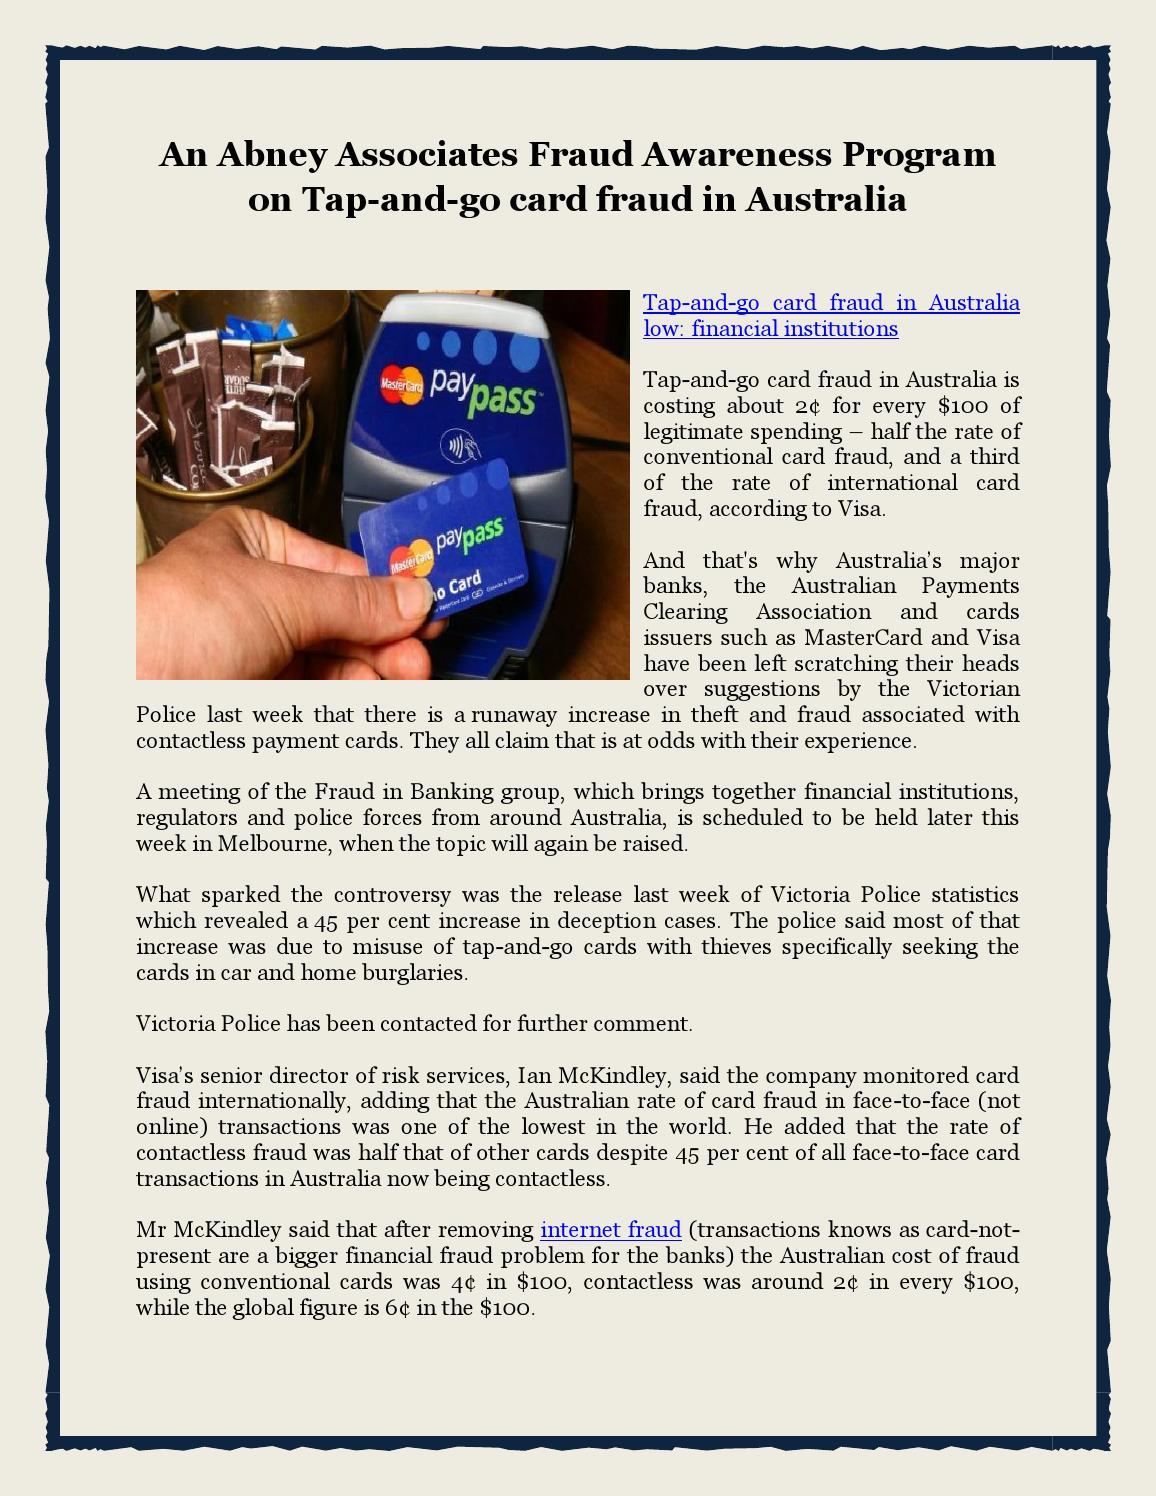 An Abney Associates Fraud Awareness Program on Tap-and-go